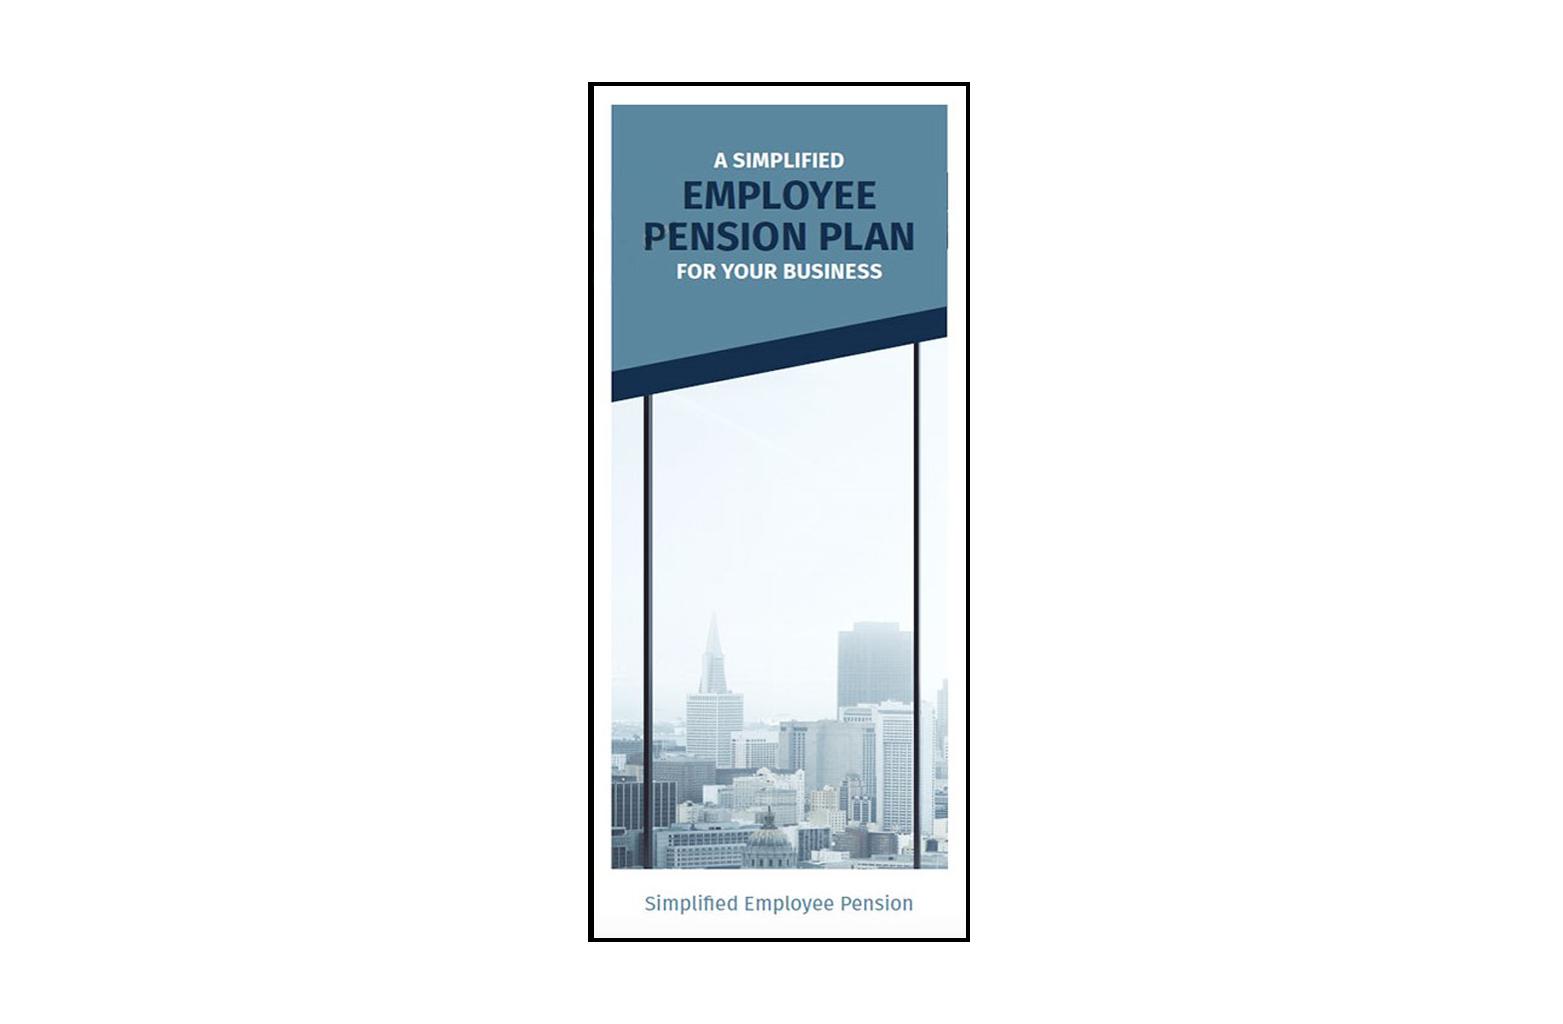 Simplified Employee Pension Plan Brochure